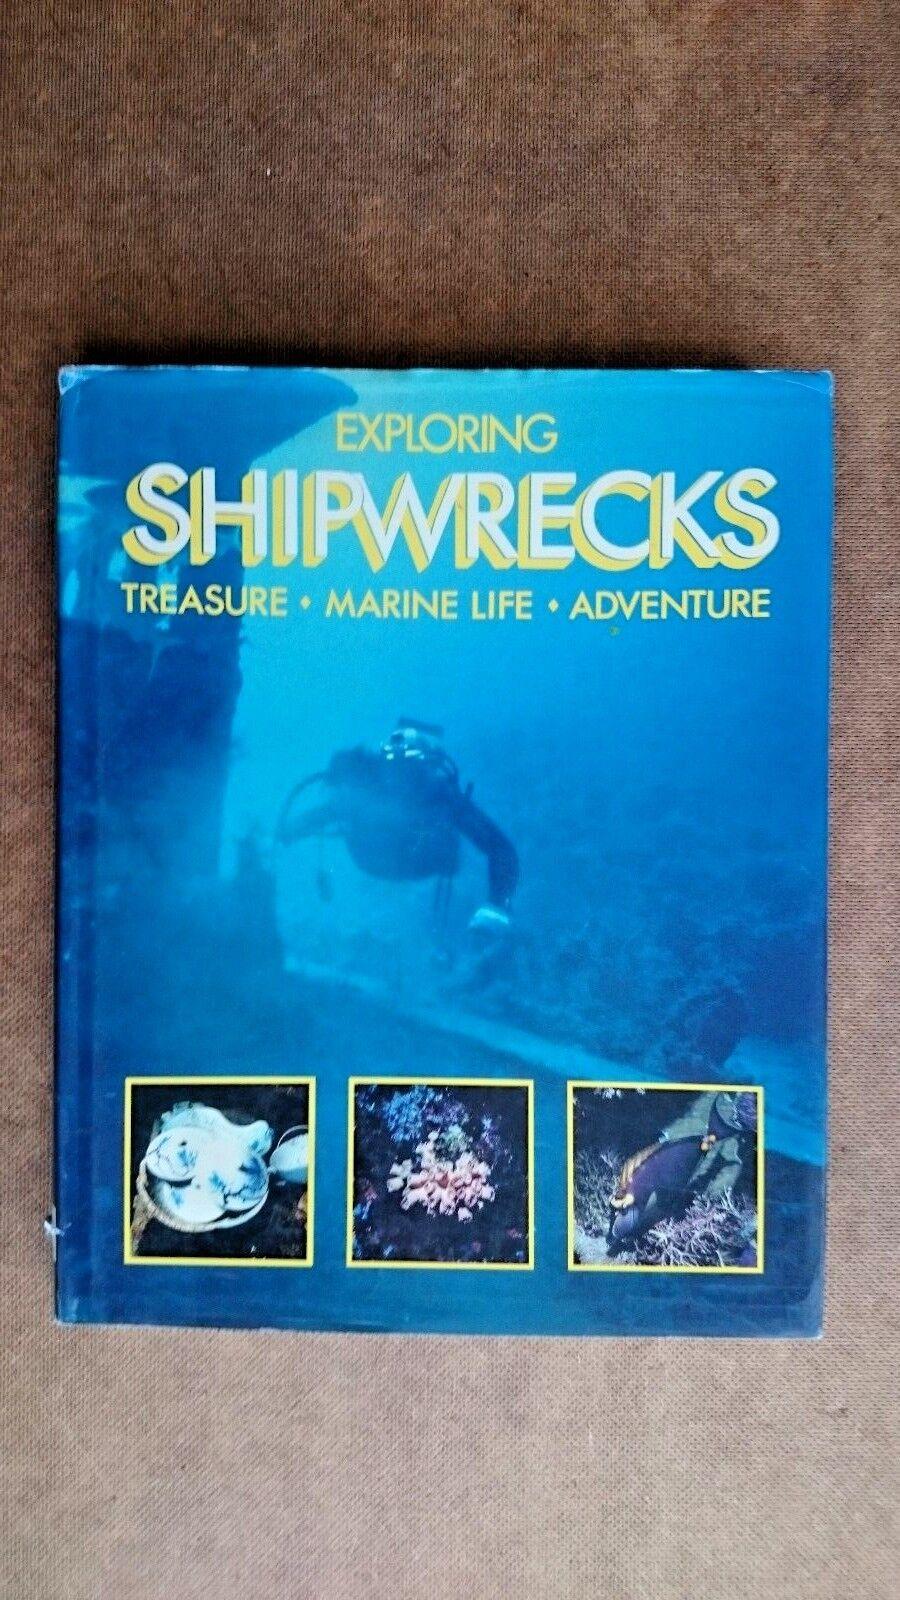 Exploring Shipwrecks by Keith Morris (Hardback, 1993)